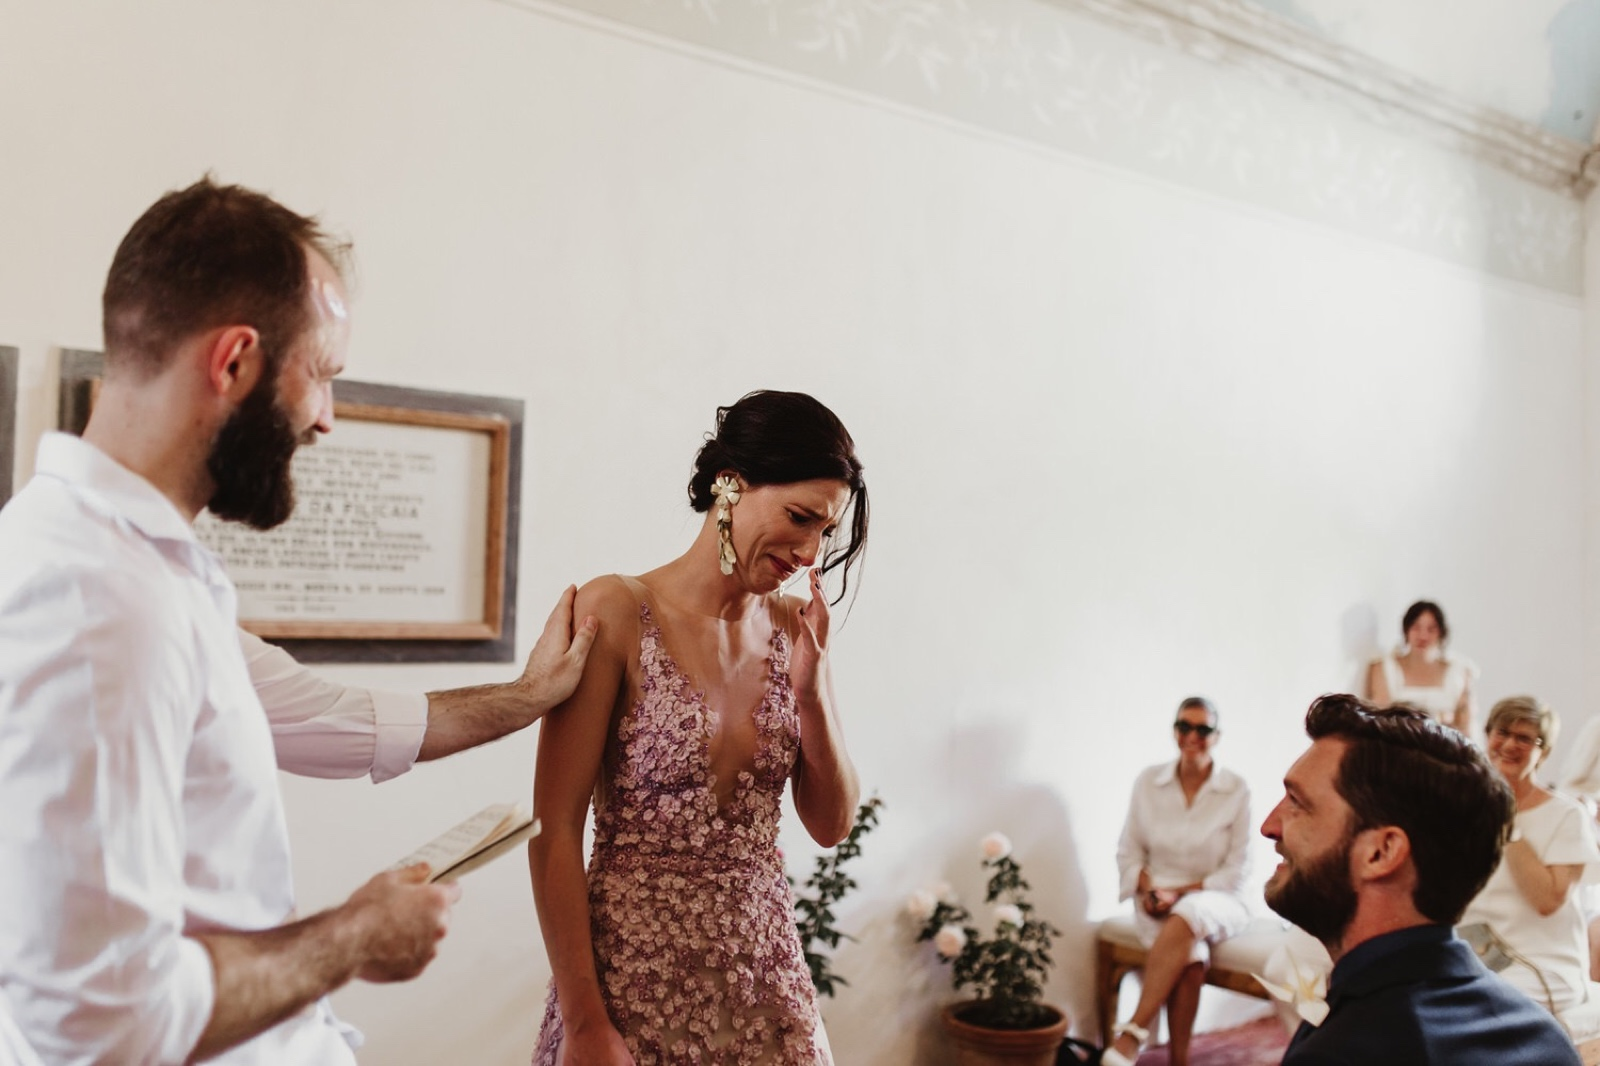 Fotomagoria Best 0f 2018 Wedding Photographer Italy28.jpg